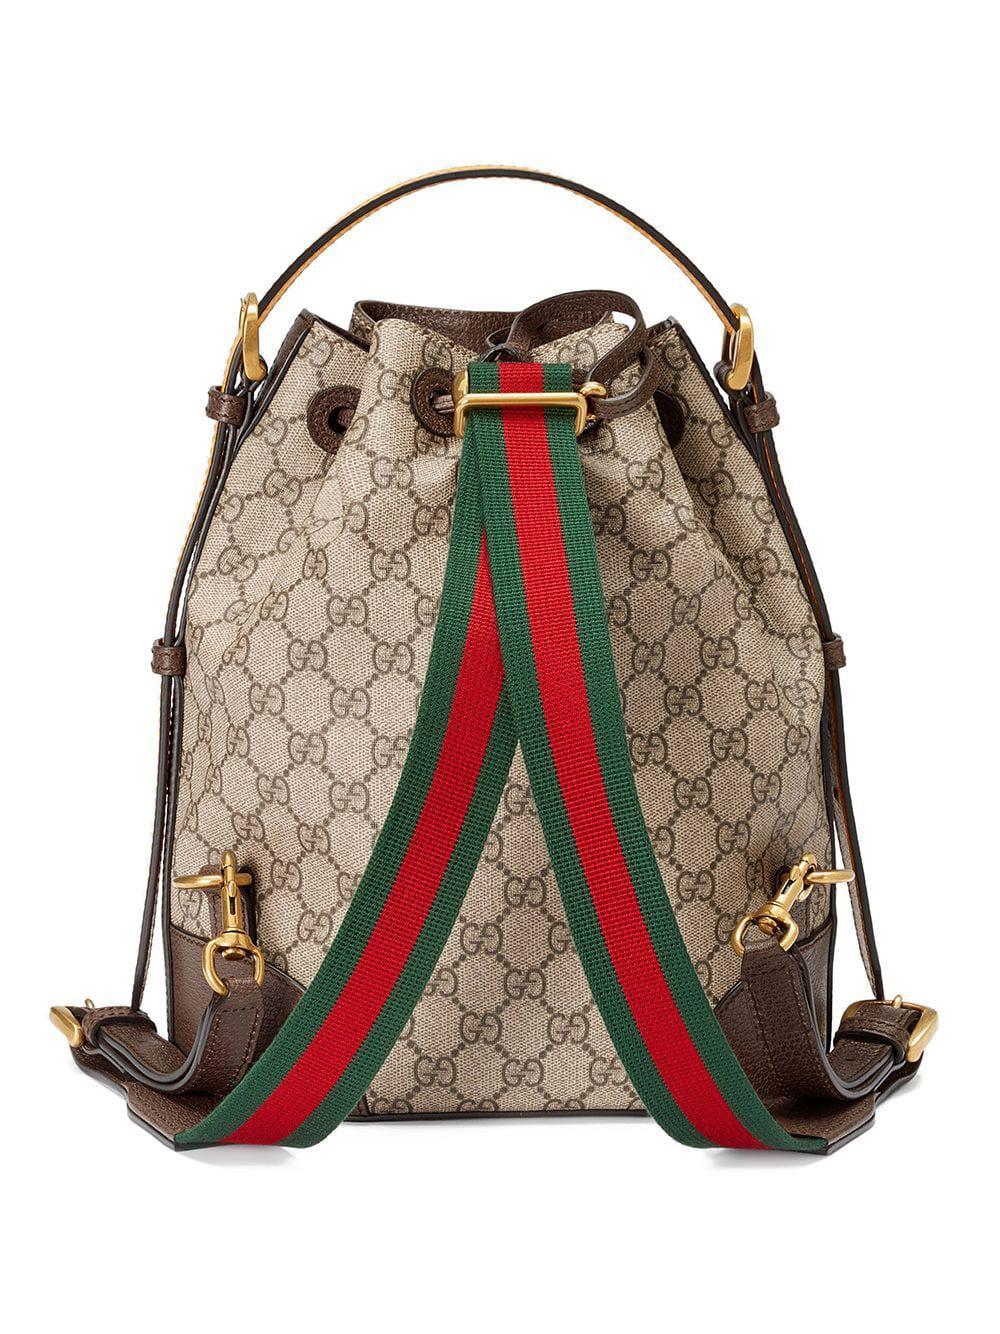 85b776bdde27 Gucci GG Supreme Backpack in Brown - Lyst